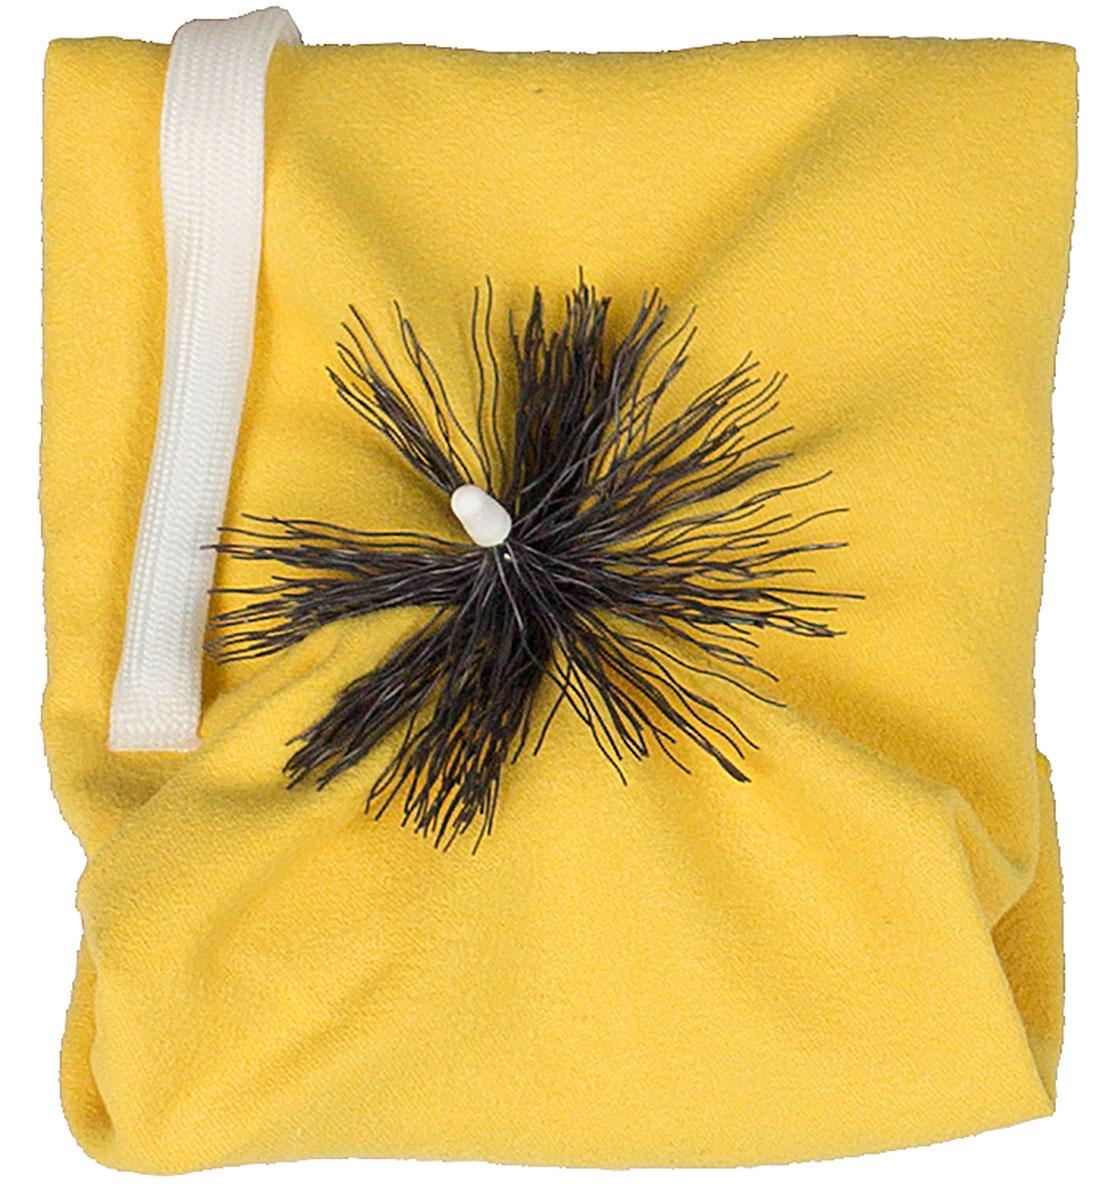 Helin Pull Thru Alto Sax Synthetic Cloth